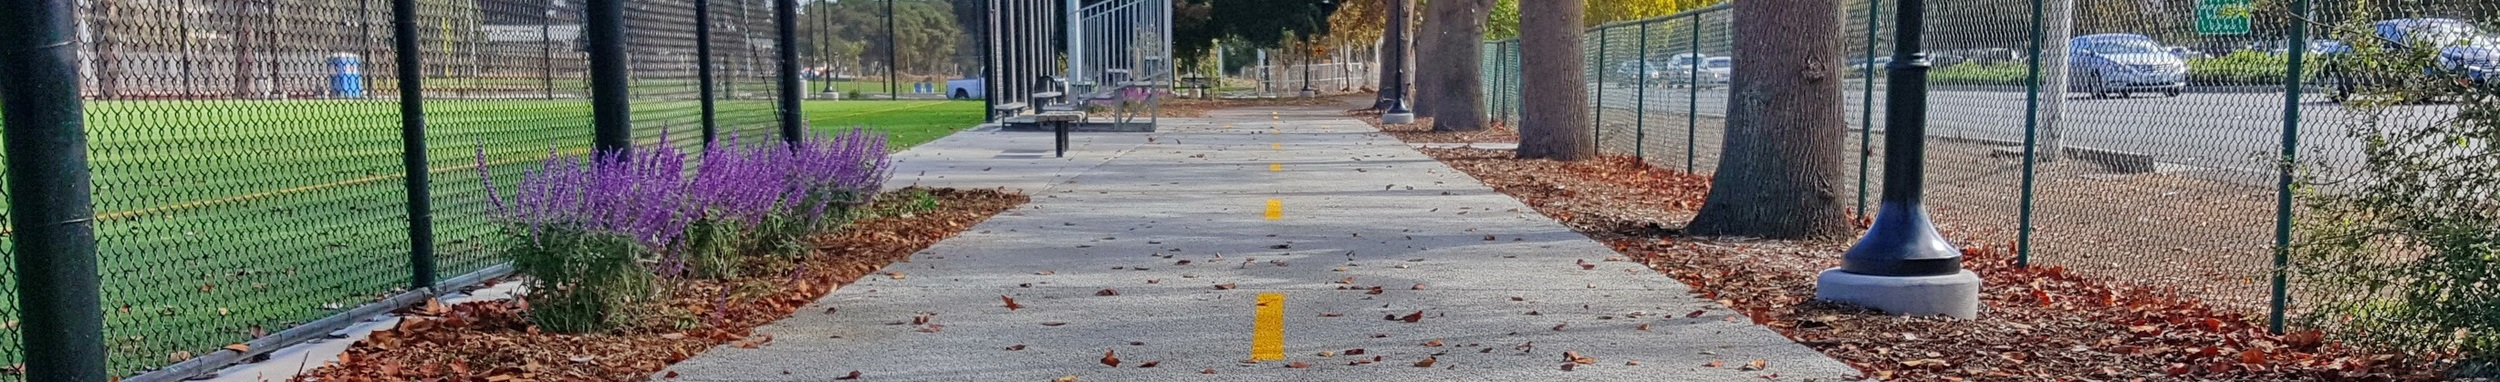 BAPC-Pervious concrete-walkway-Palo Alto